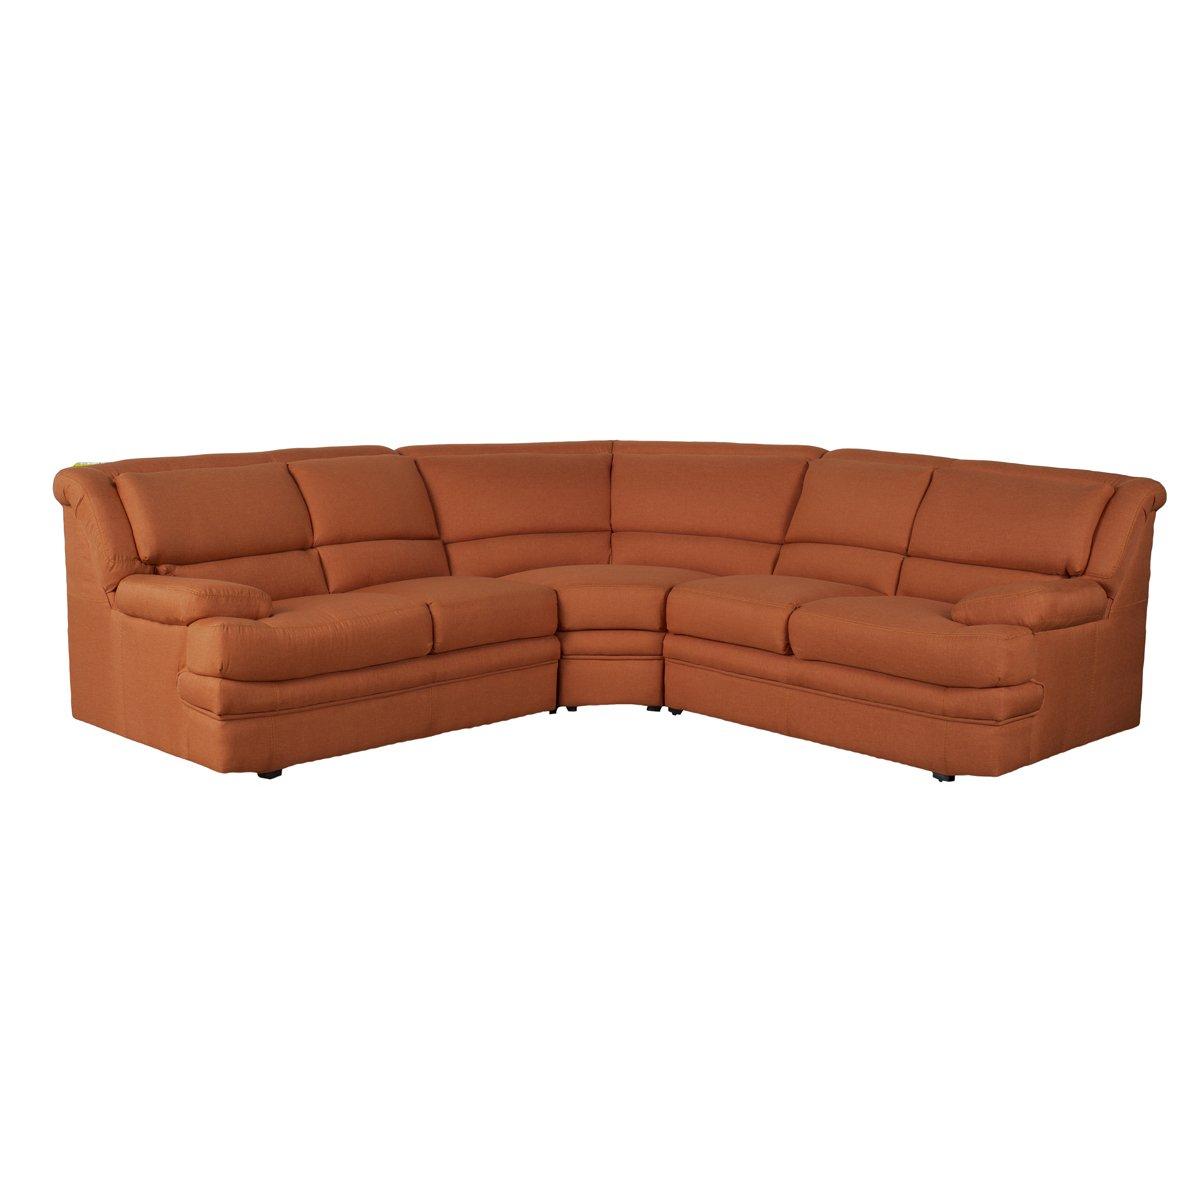 Sala Modular Lando Color Naranja Sears Com Mx Me Entiende  # Muebles Liz Garantia